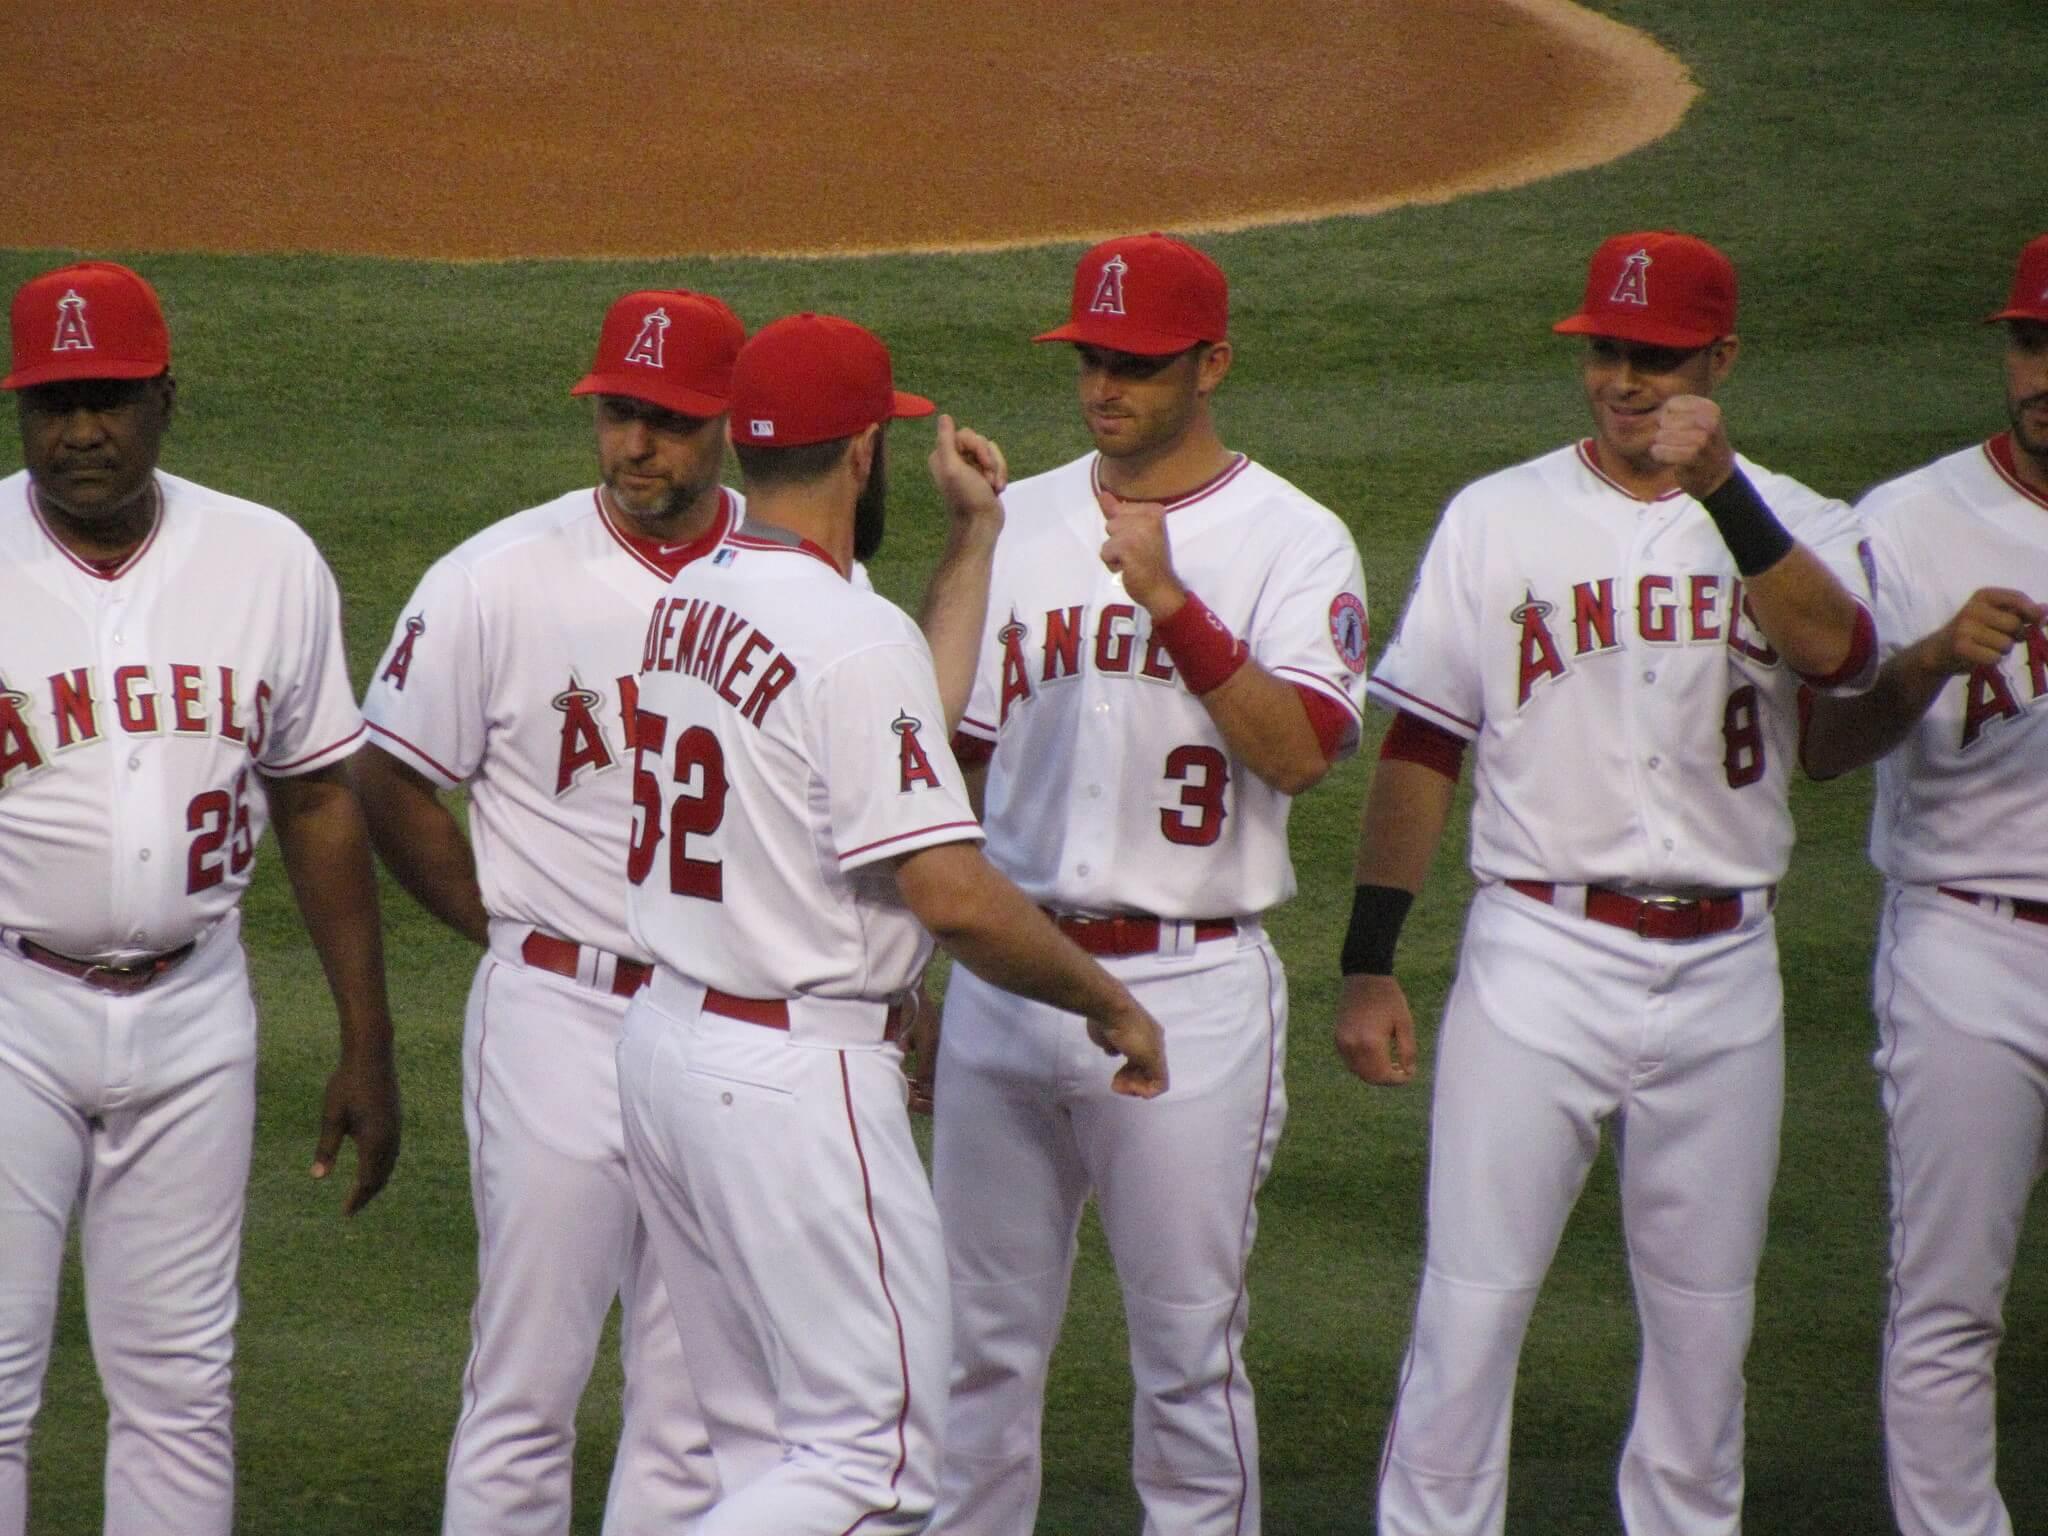 Angels baseball players